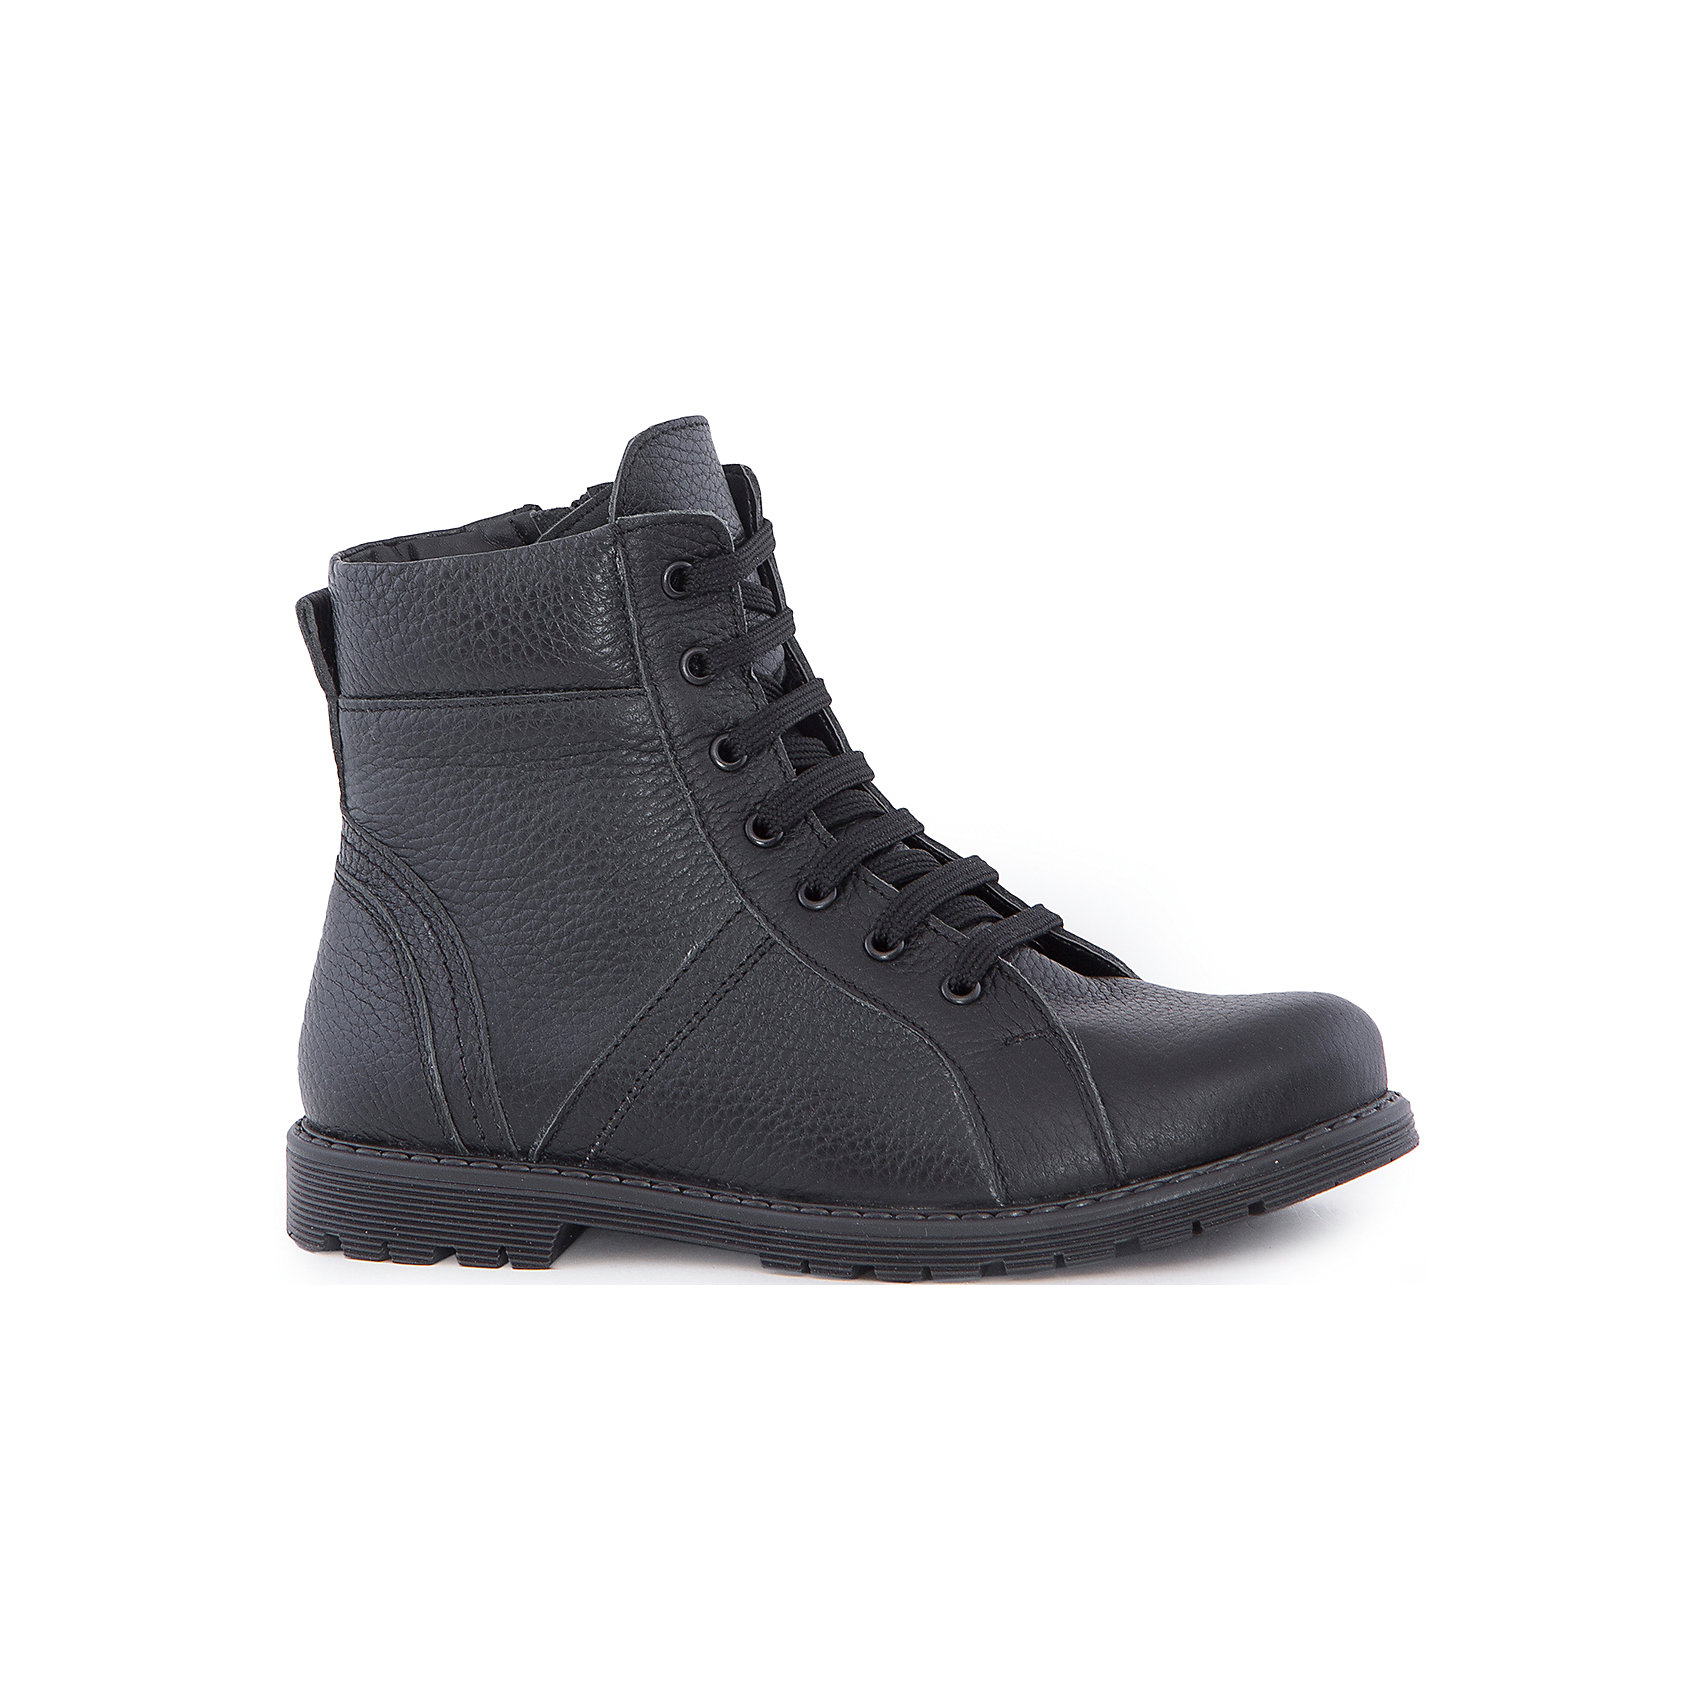 MURSU Ботинки для мальчика Mursu ботинки mursu 200743 черный р 37